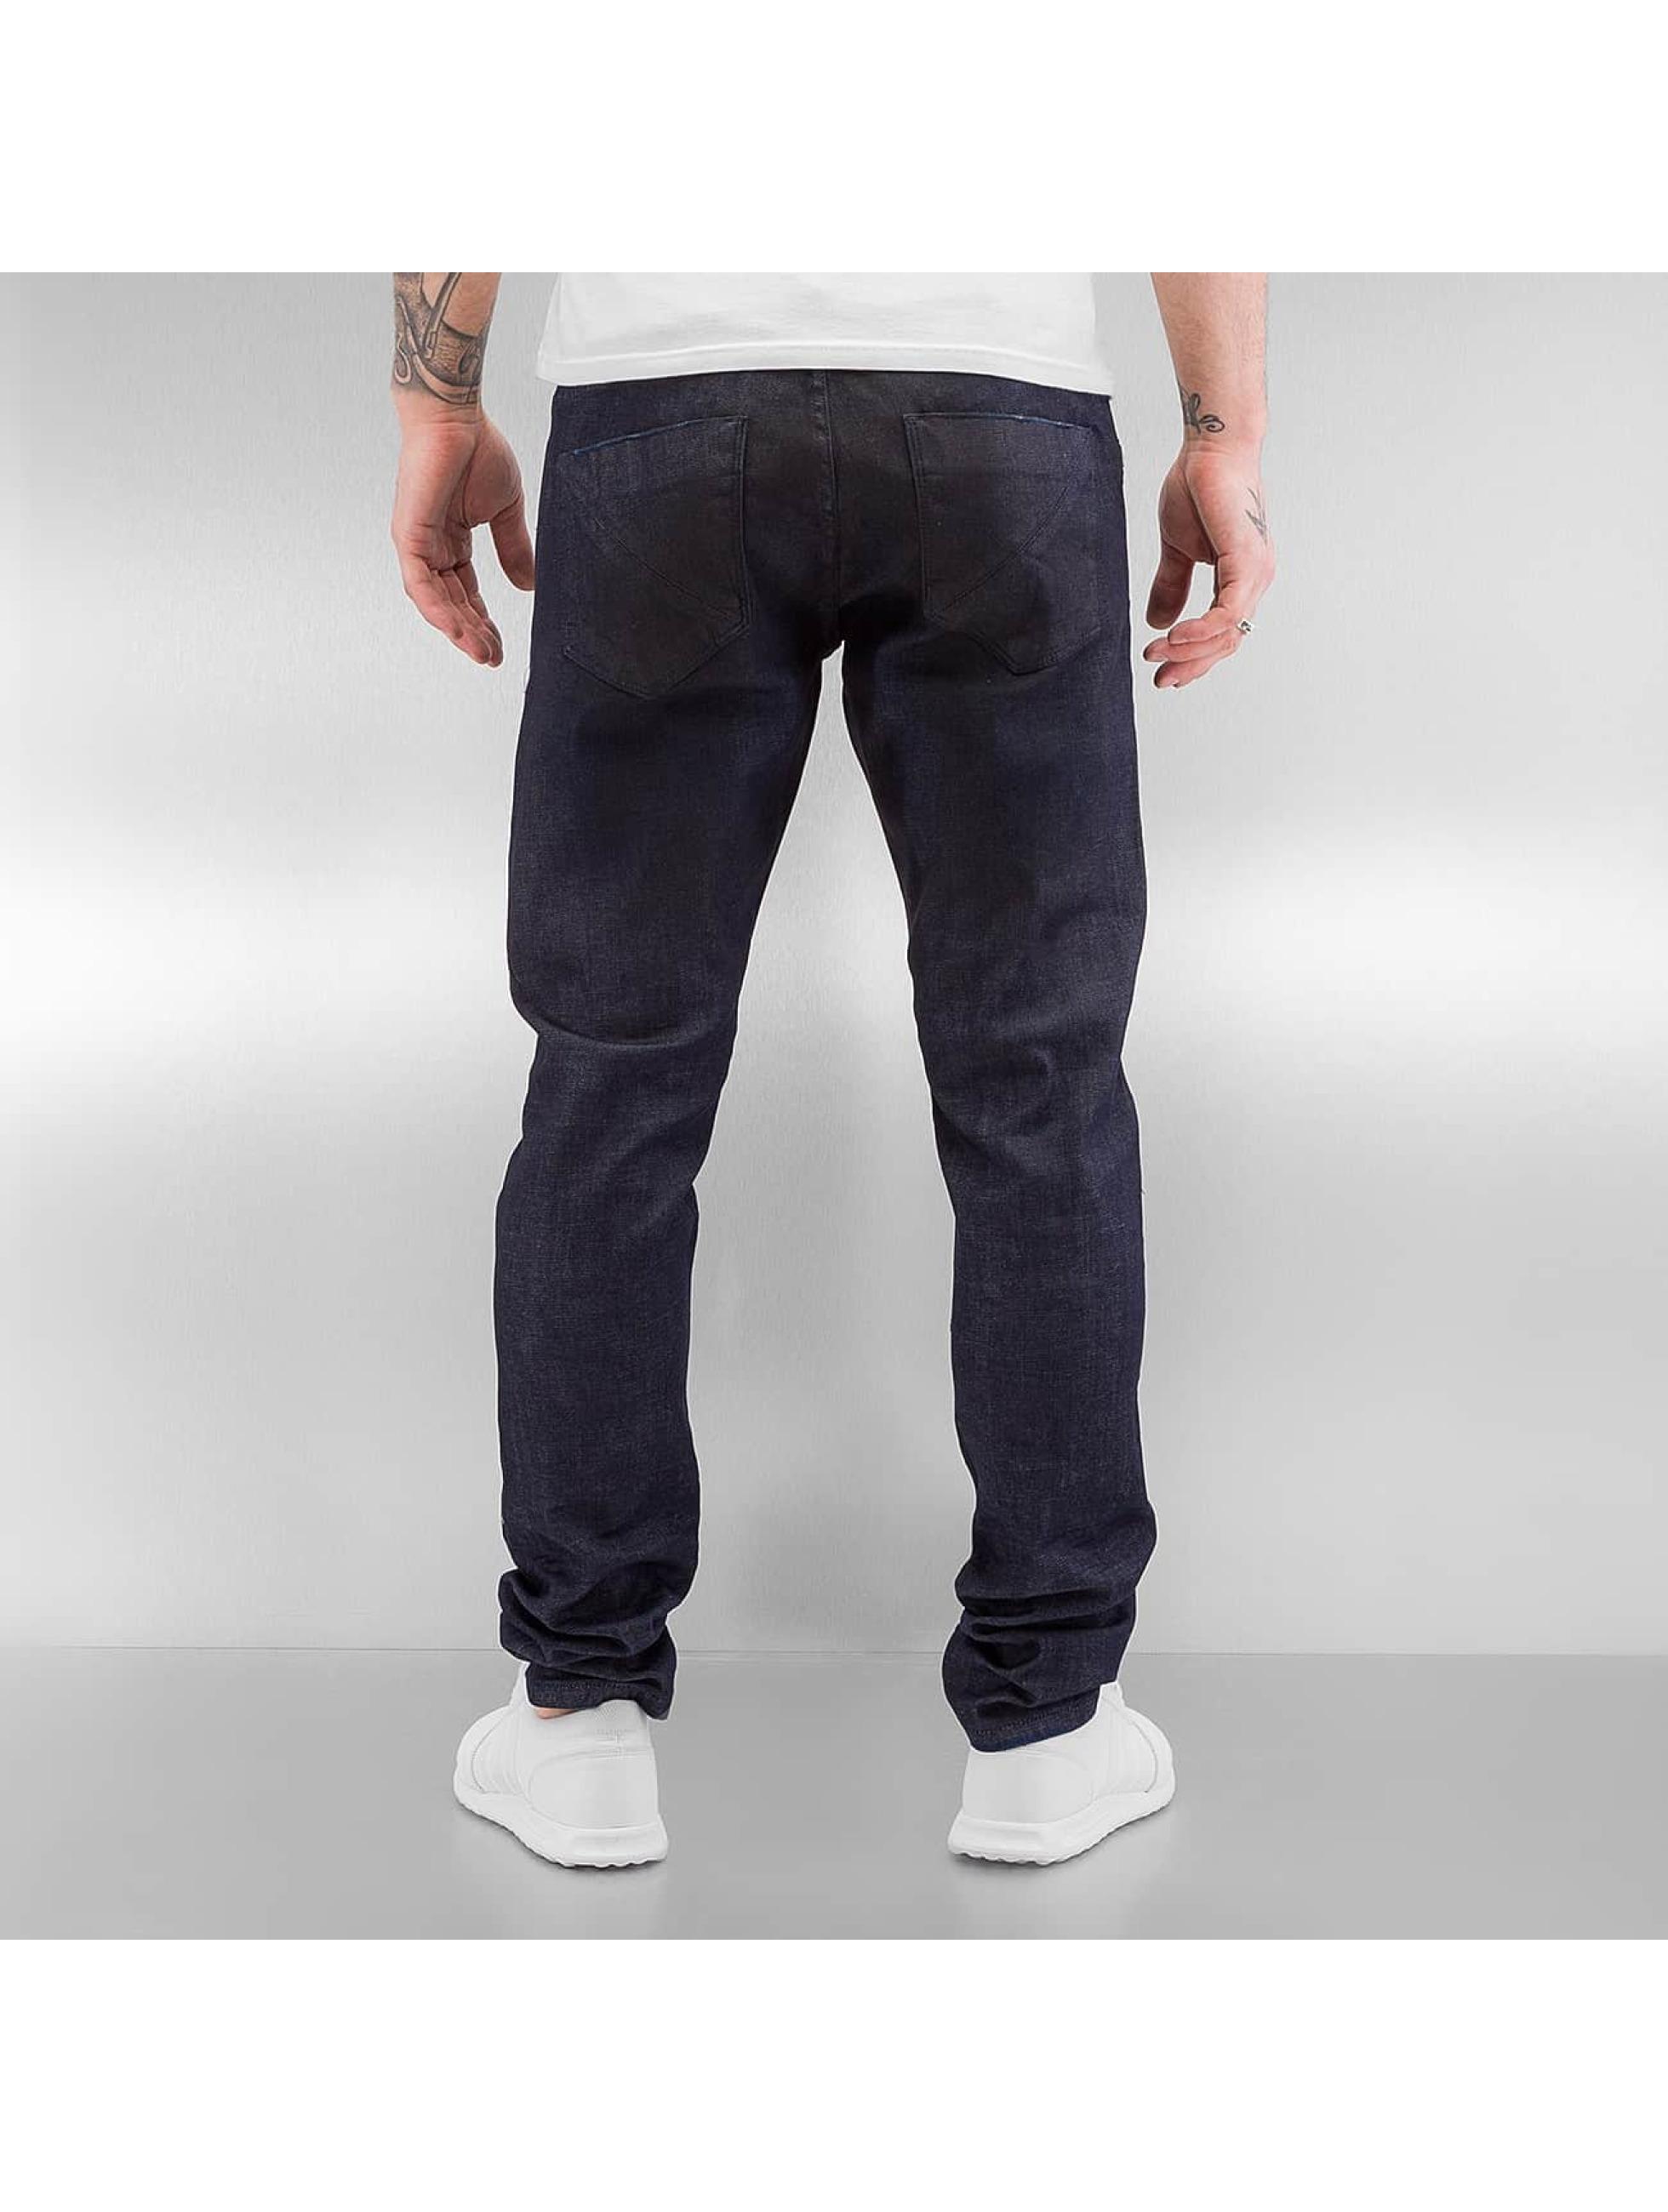 2Y Skinny Jeans Dalius black